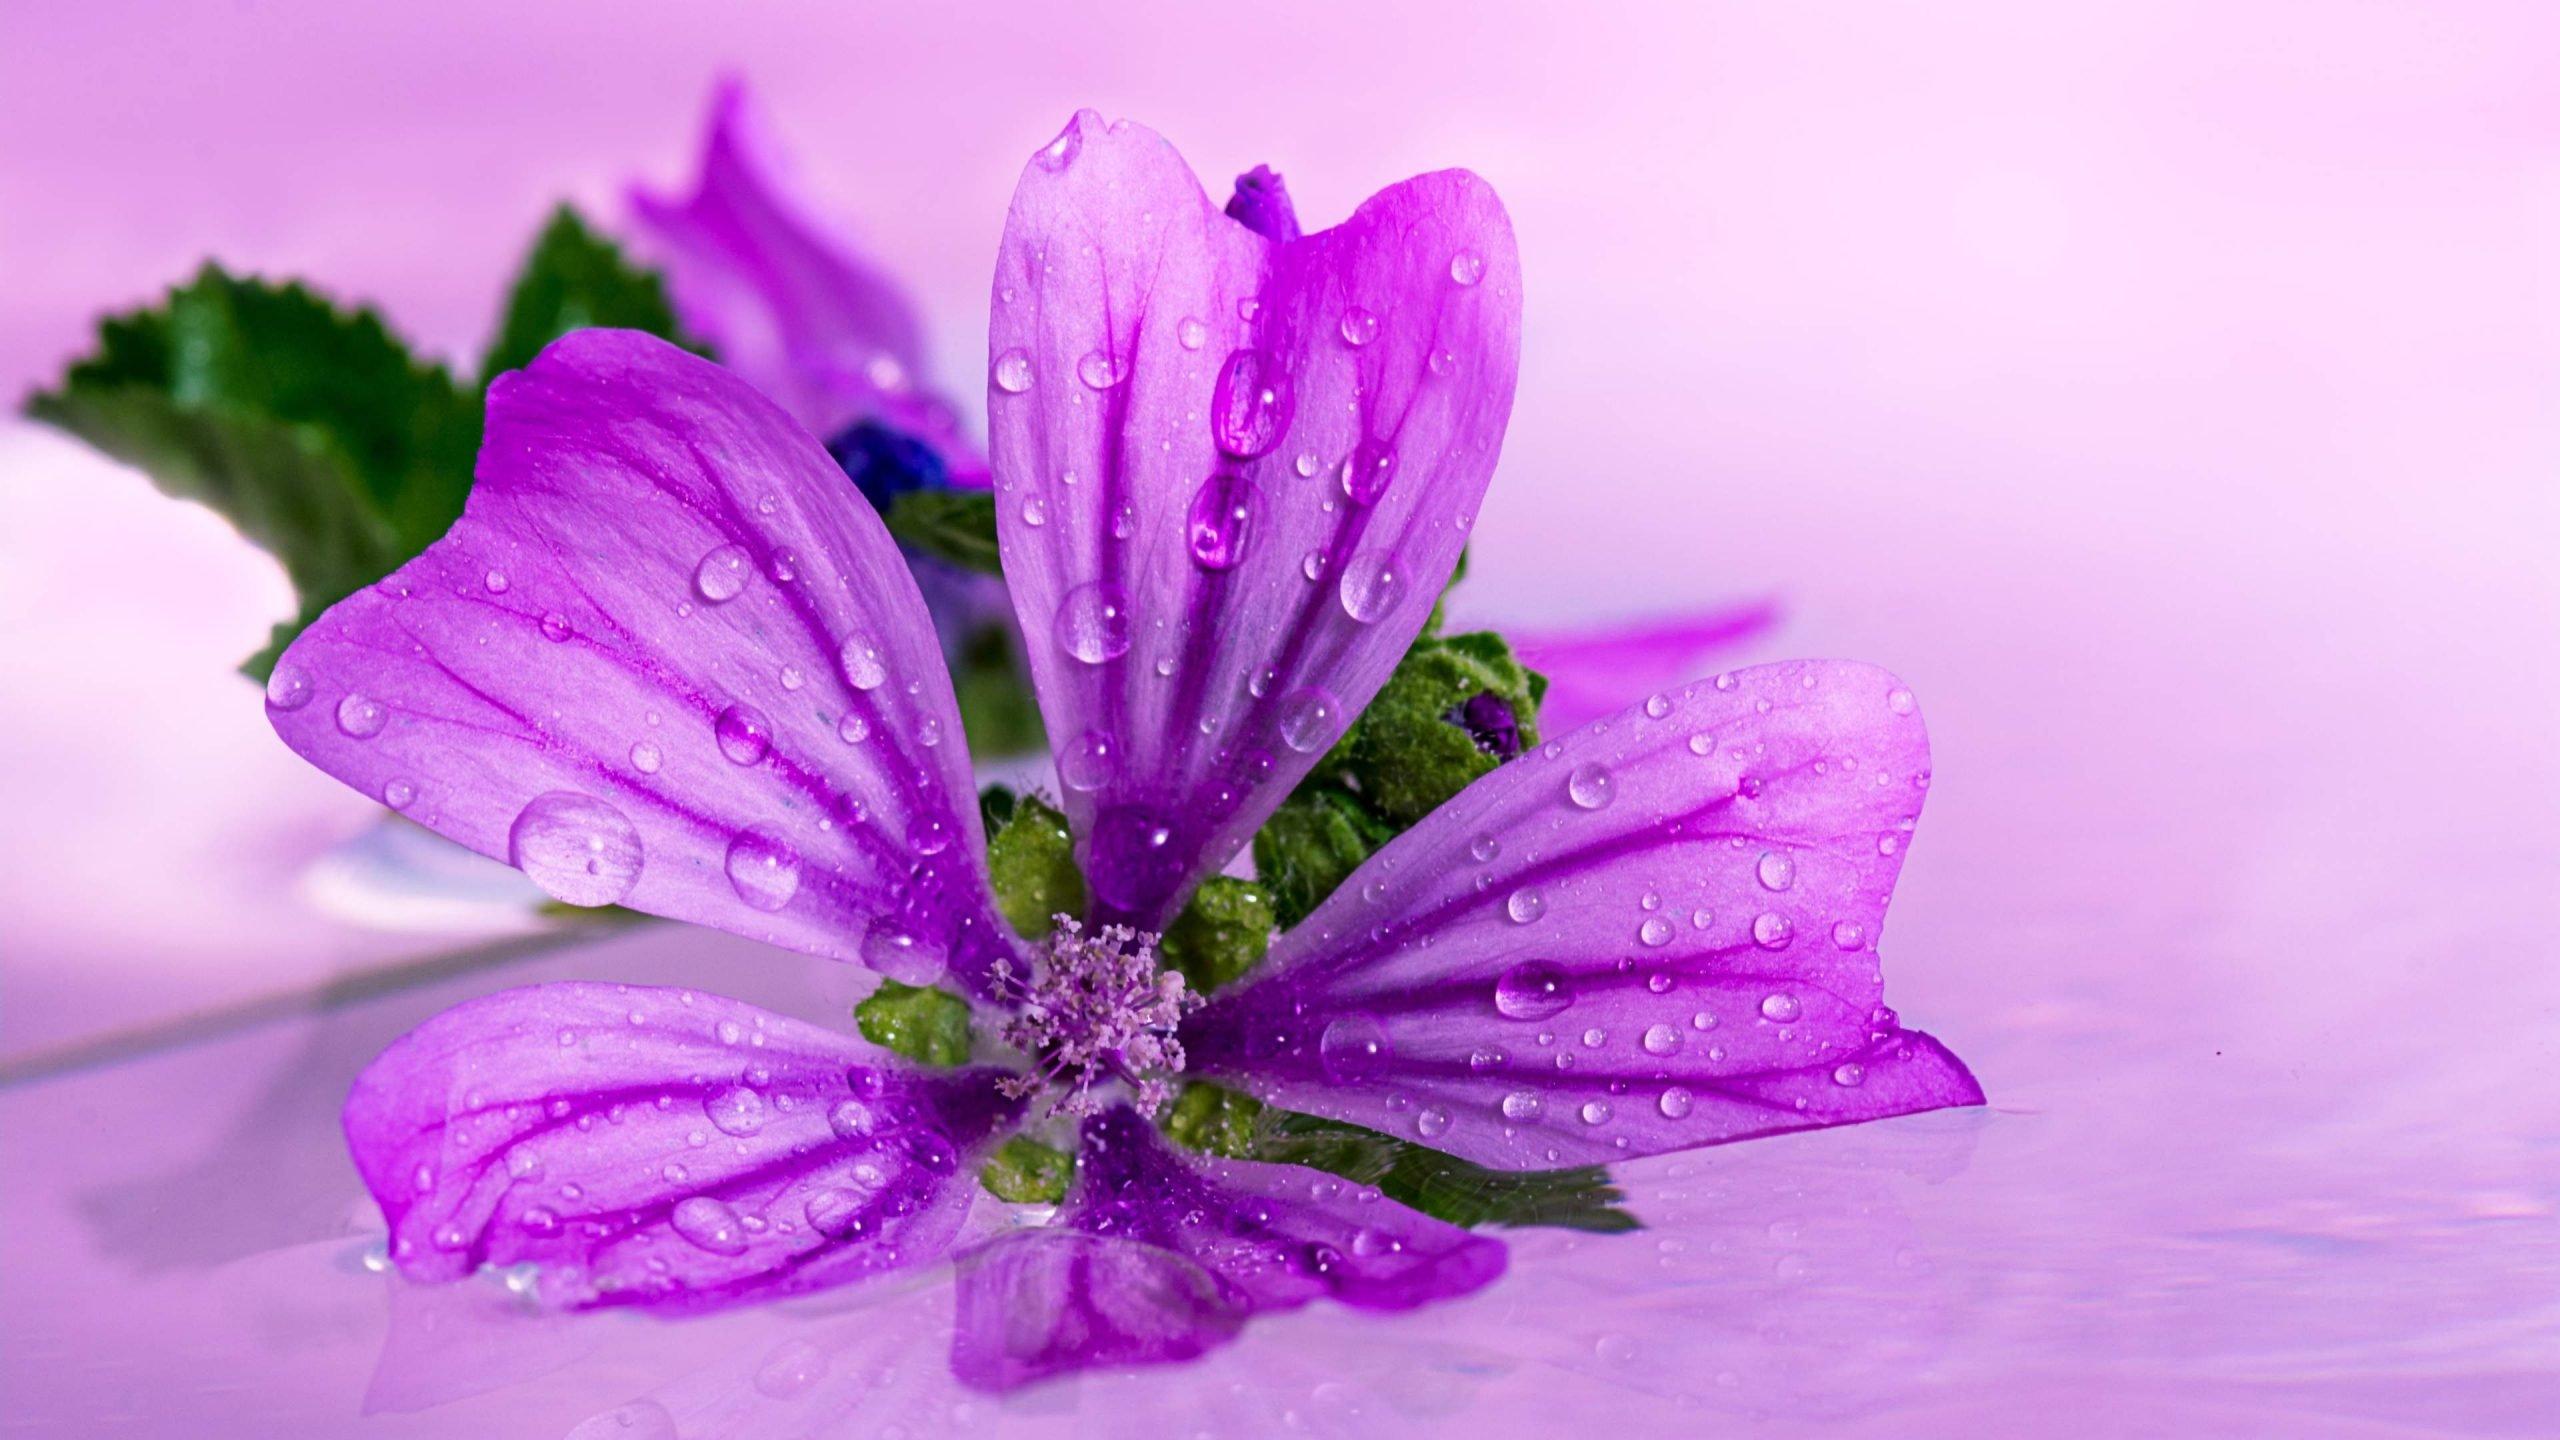 Download Hd 2560x1440 Purple Flower Computer Wallpaper Id 287228 For